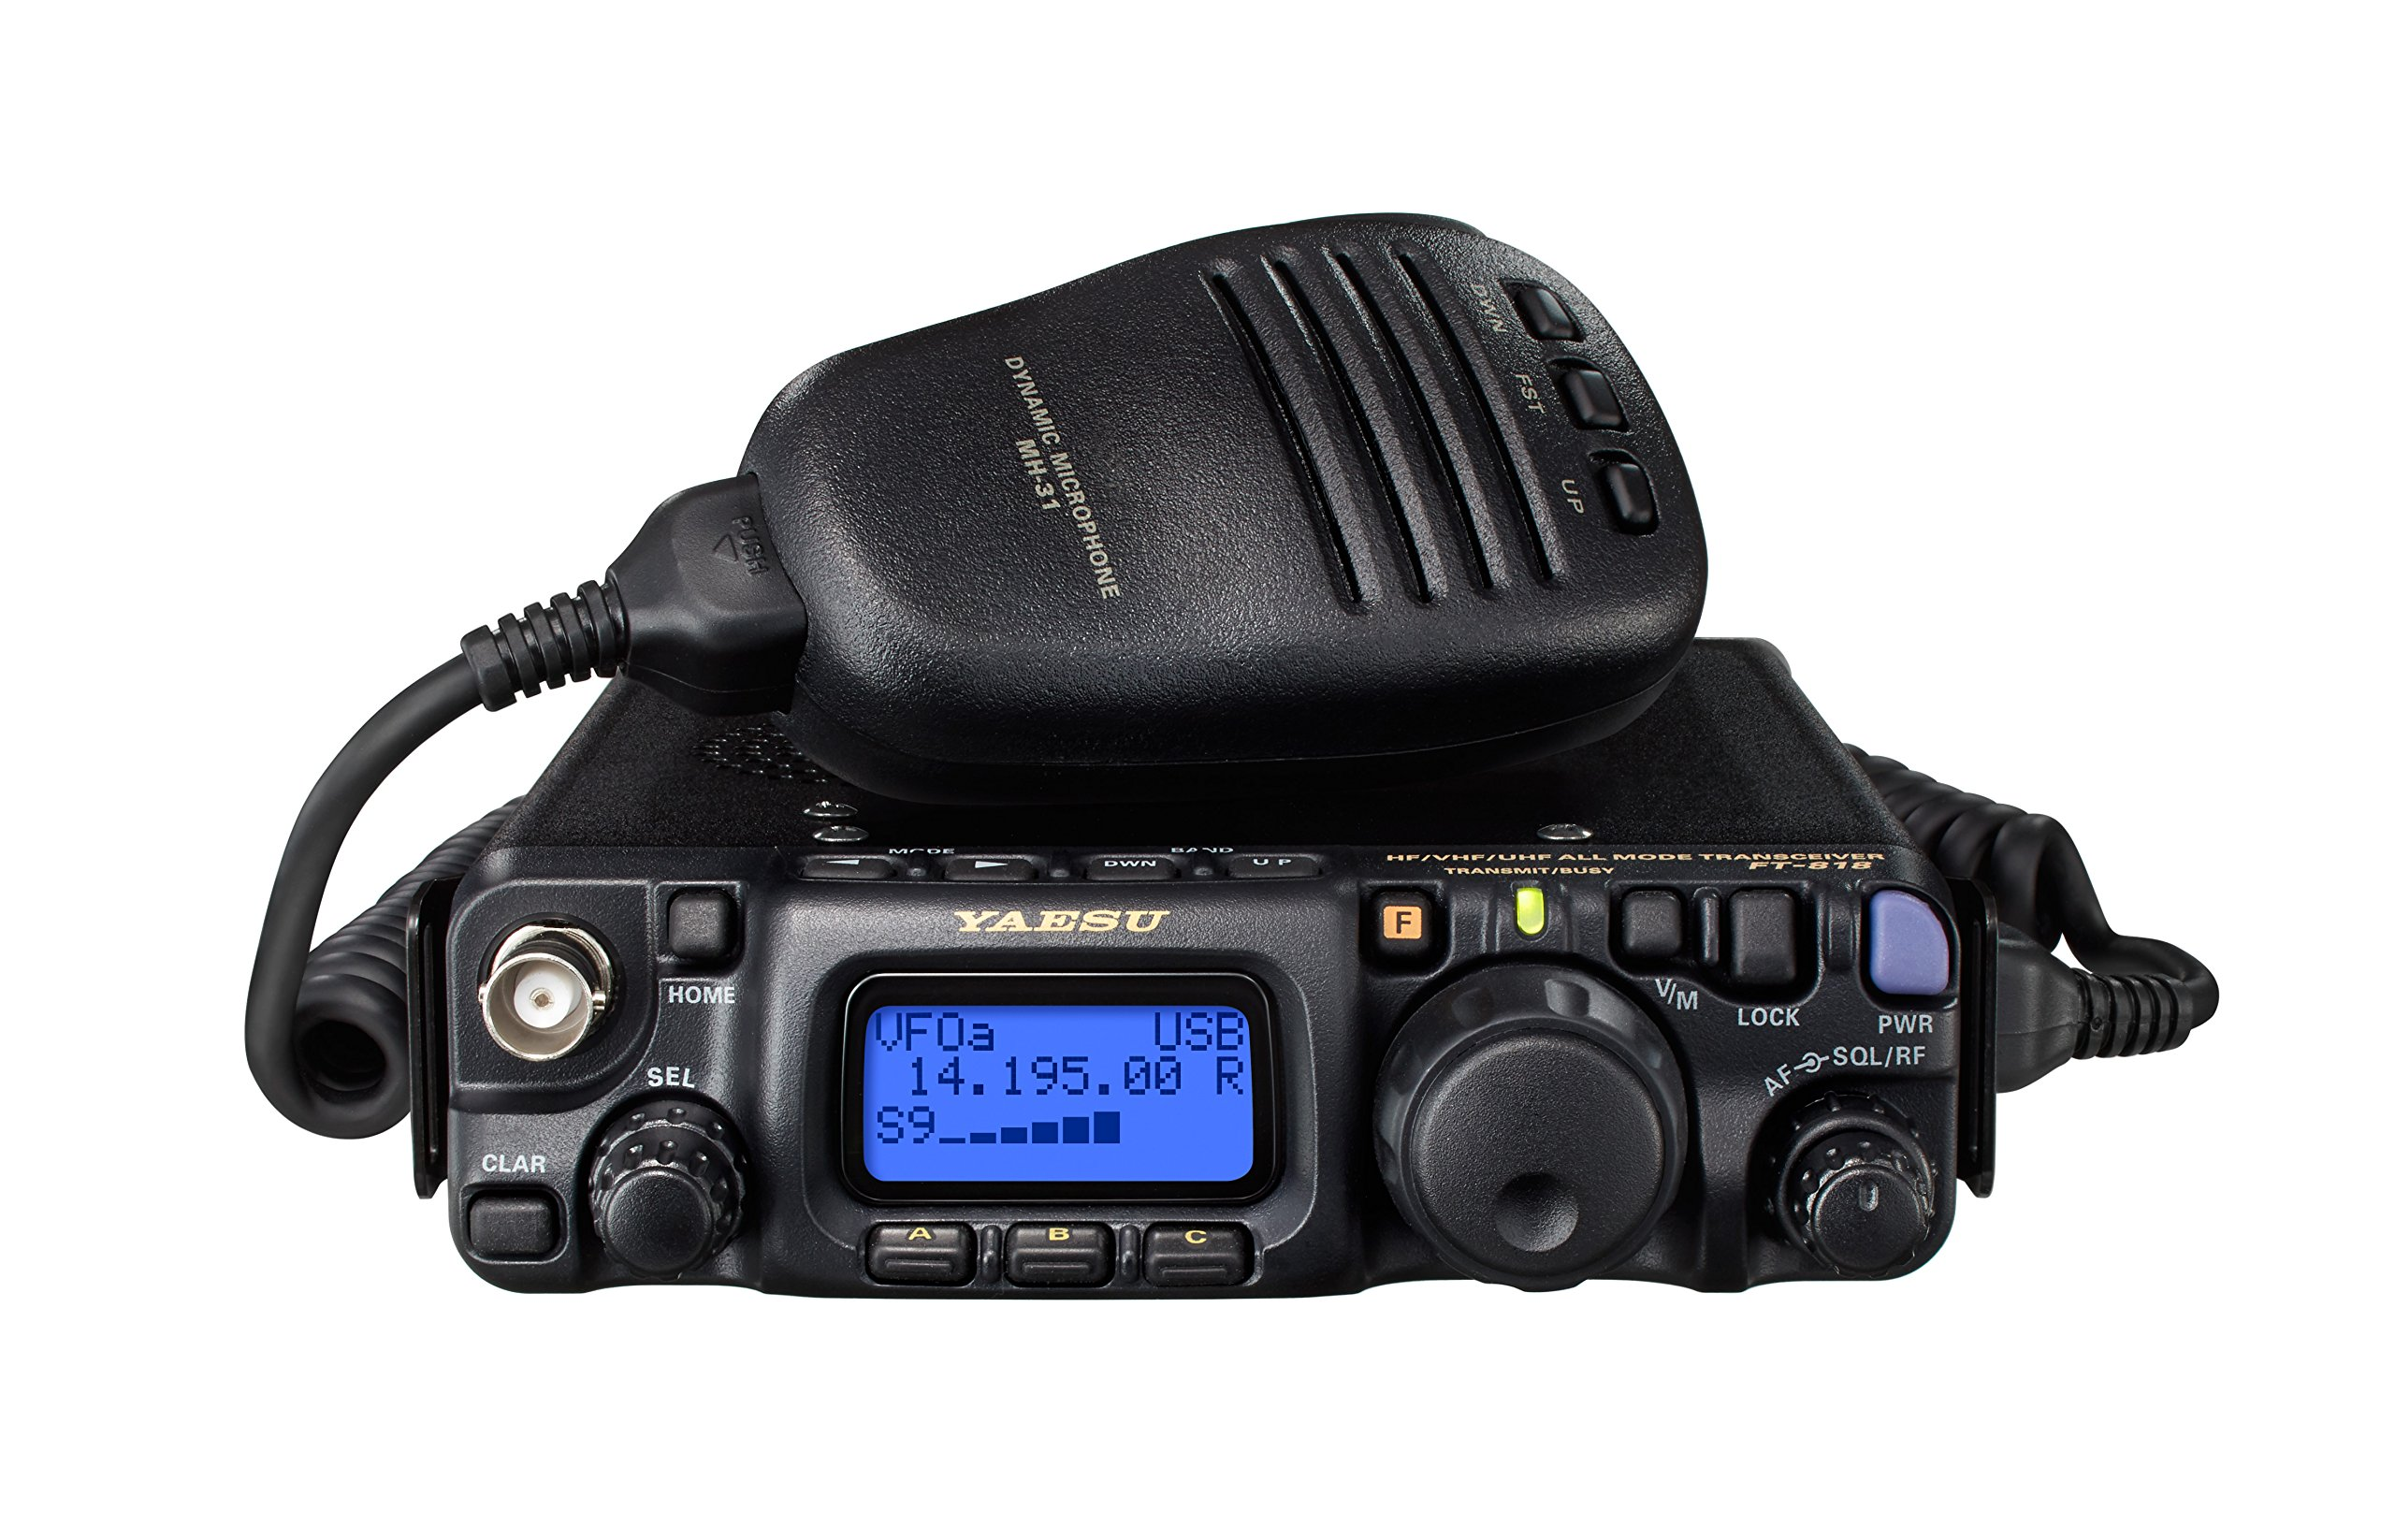 Yaesu FT-818ND FT-818 6W HF/VHF/UHF All Mode Mobile Transceiver by Yaesu